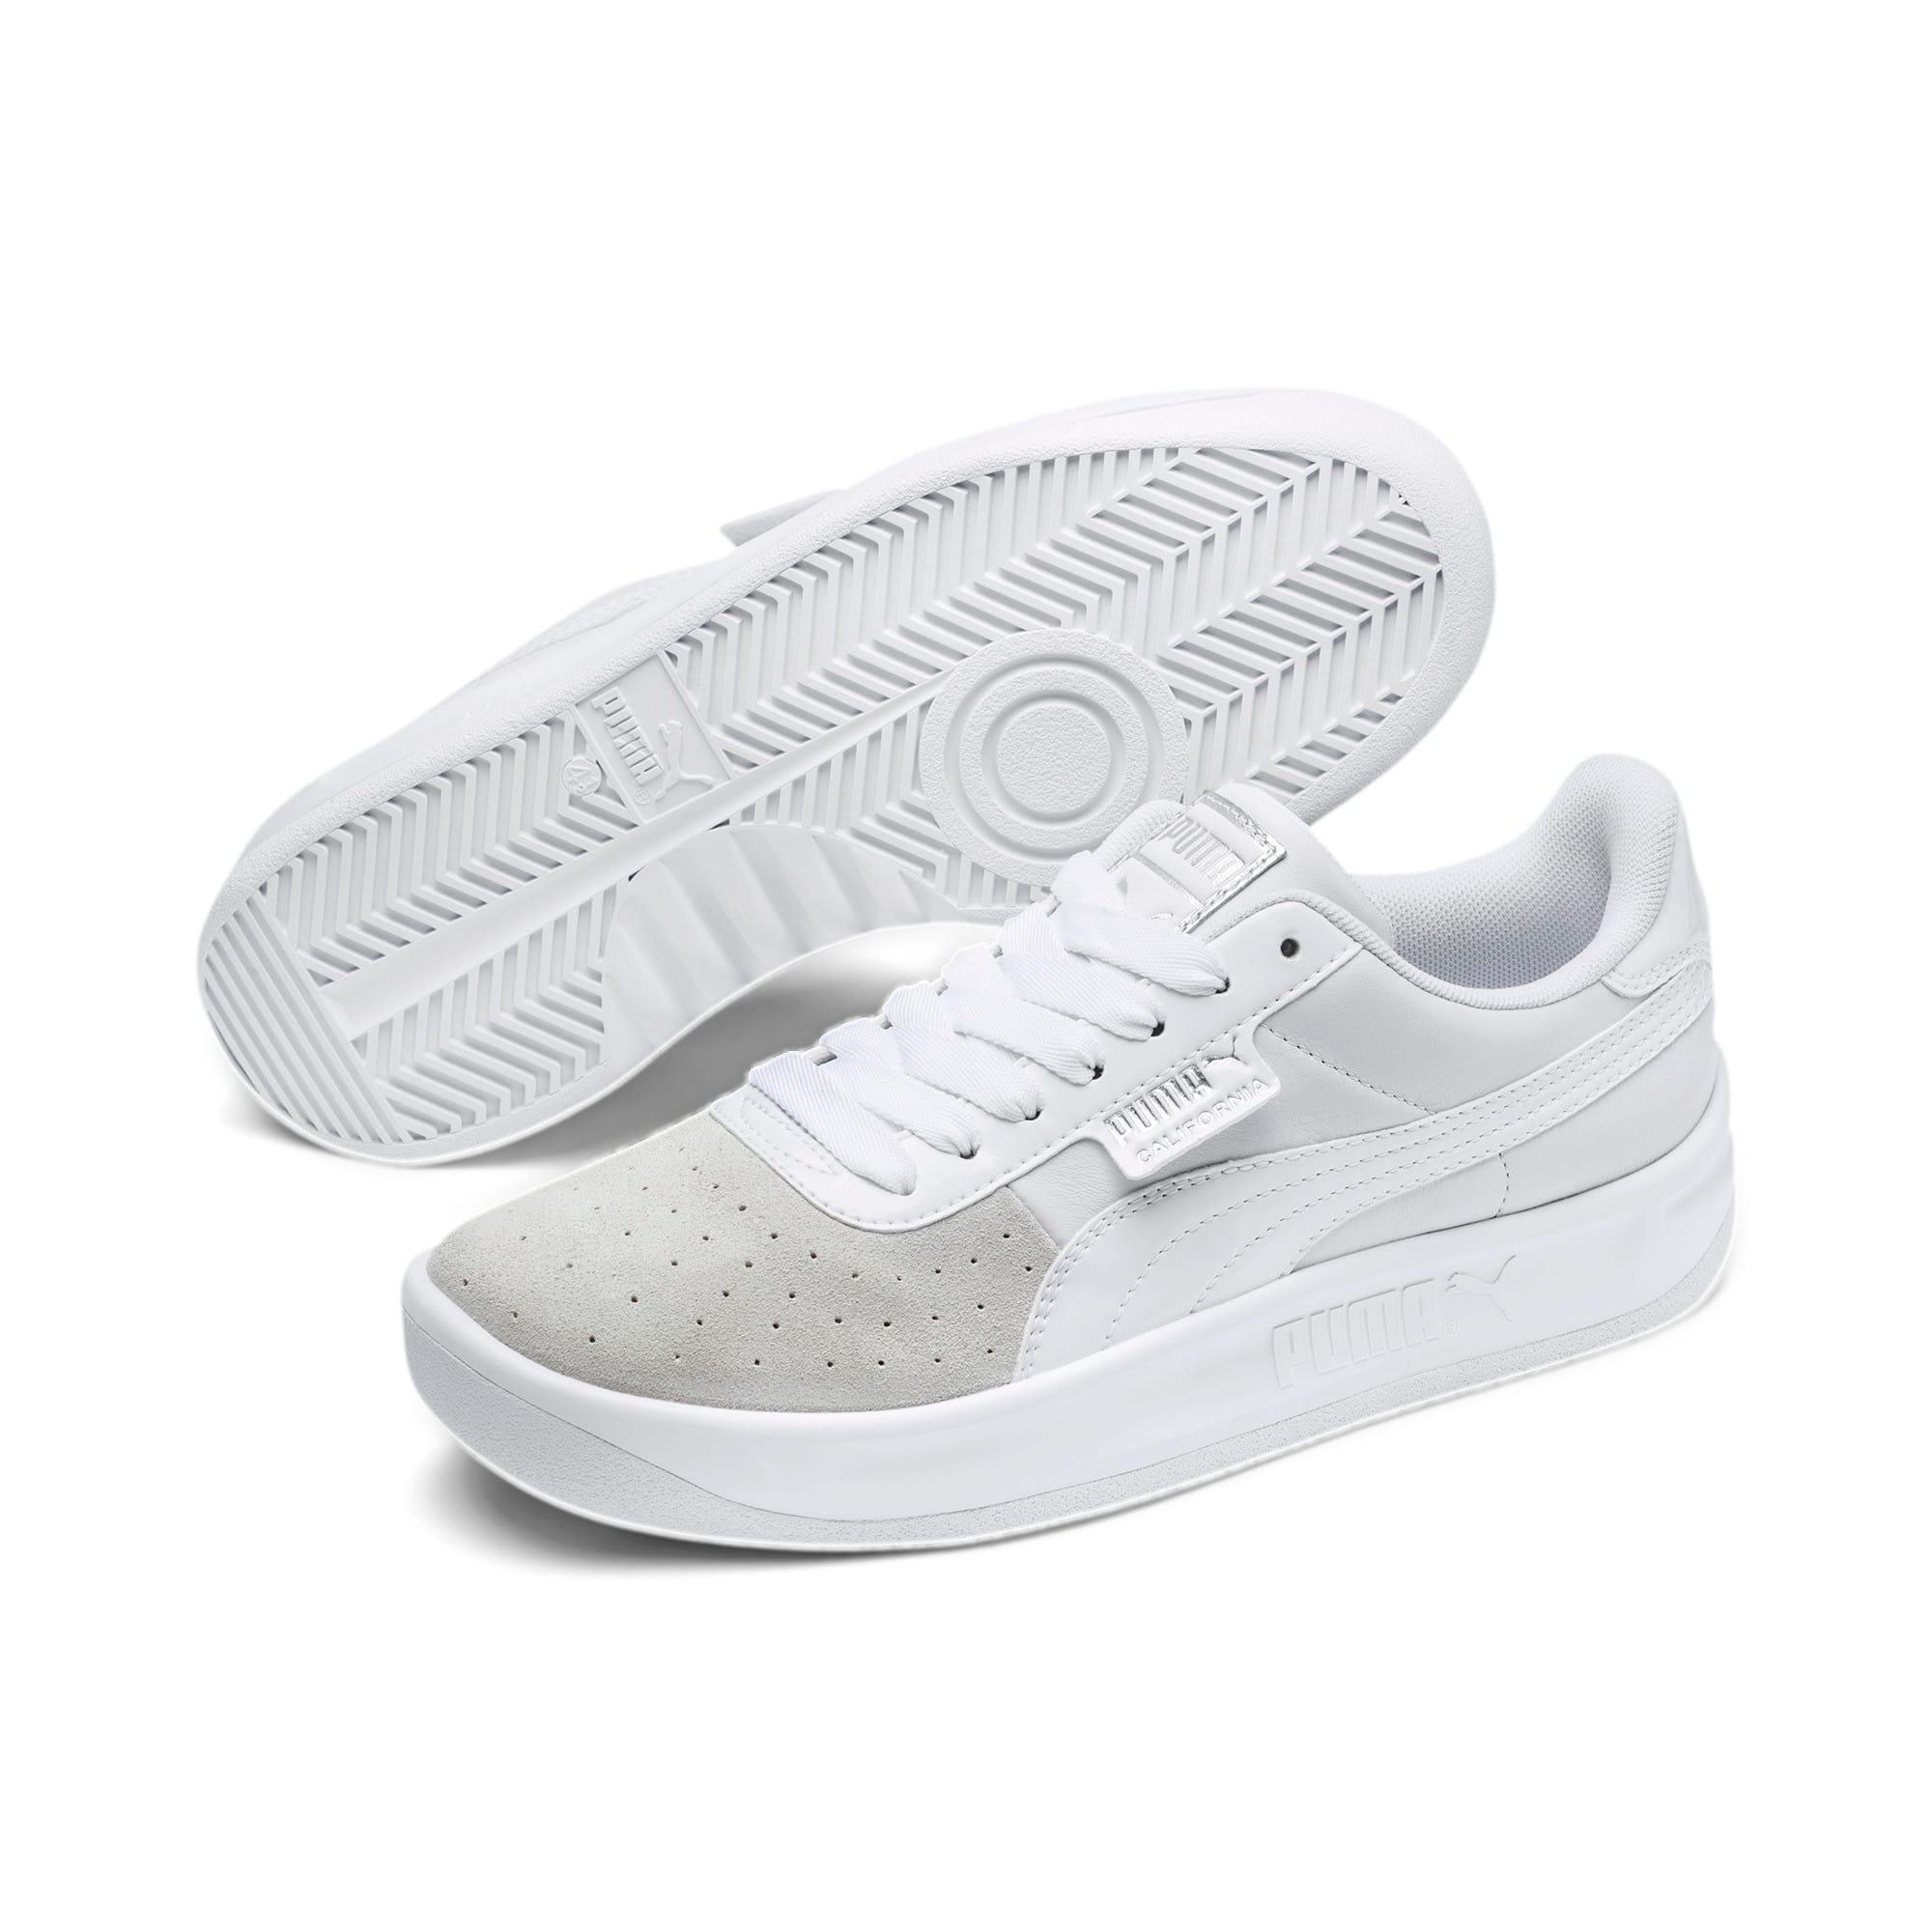 Thumbnail 3 of California Monochrome Women's Sneakers, Puma White-Puma Silver, medium